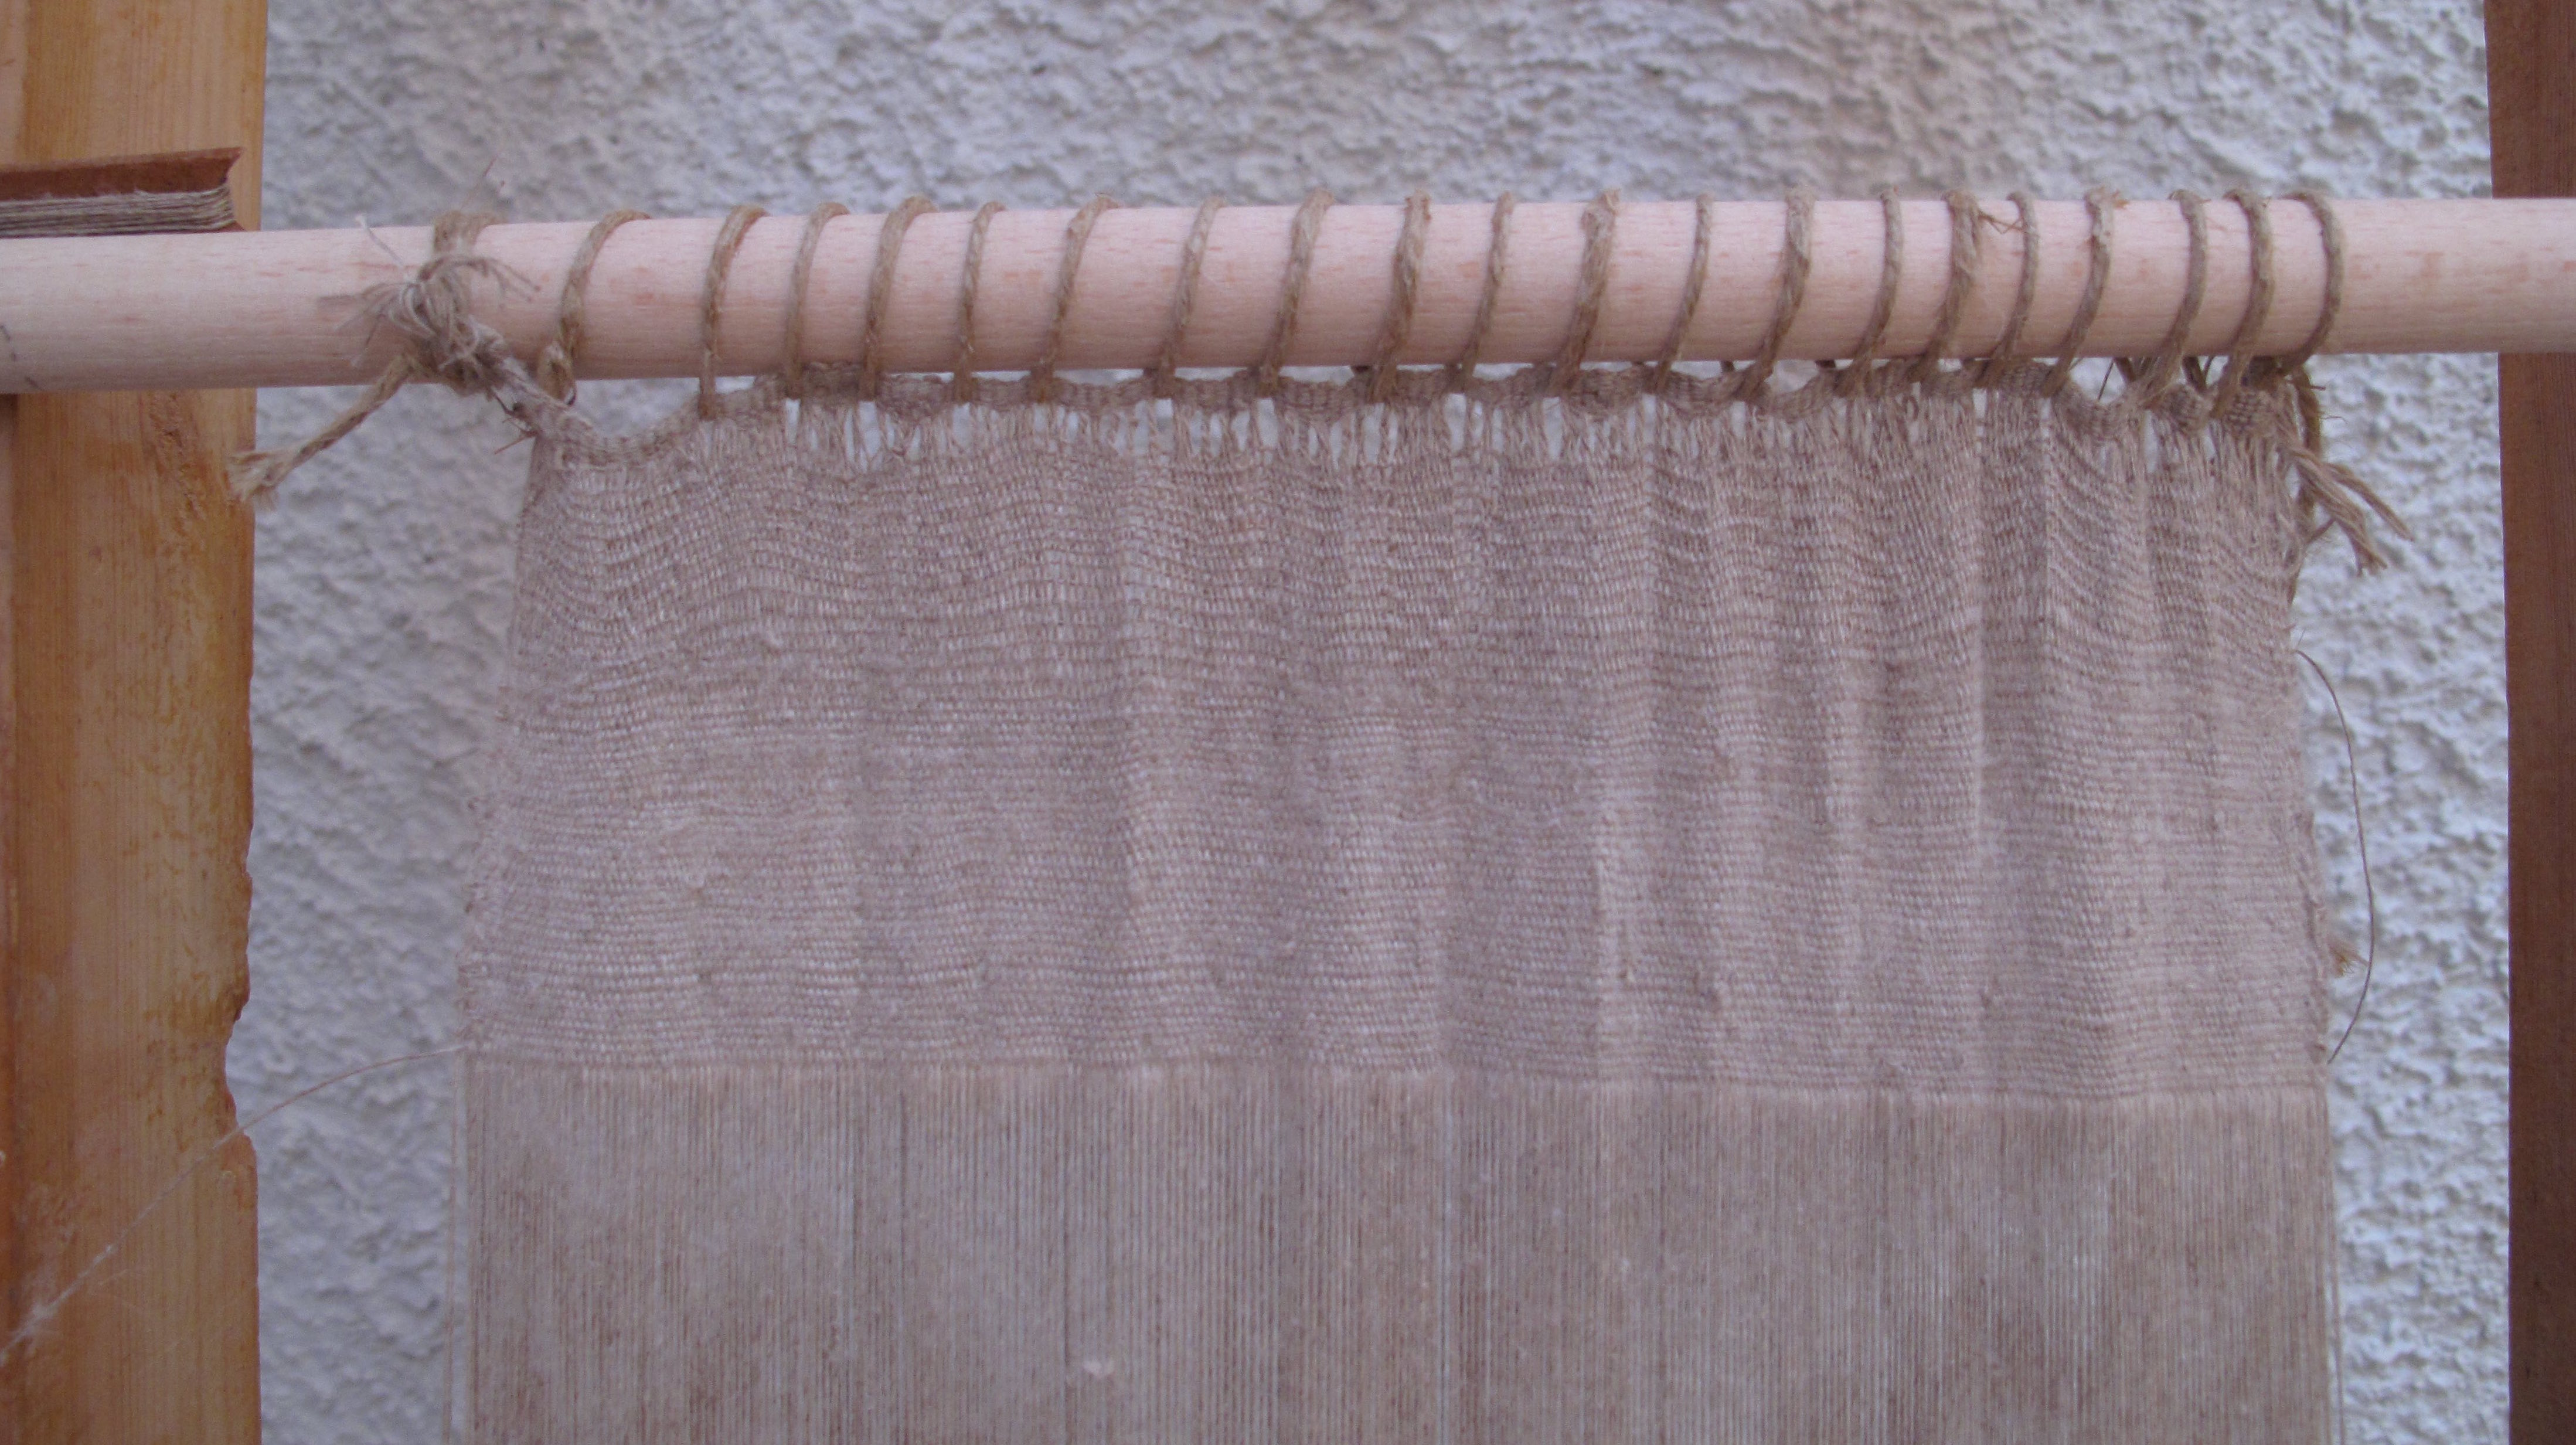 The reconstructed fabric on the loom. Photo S. Spantidaki.